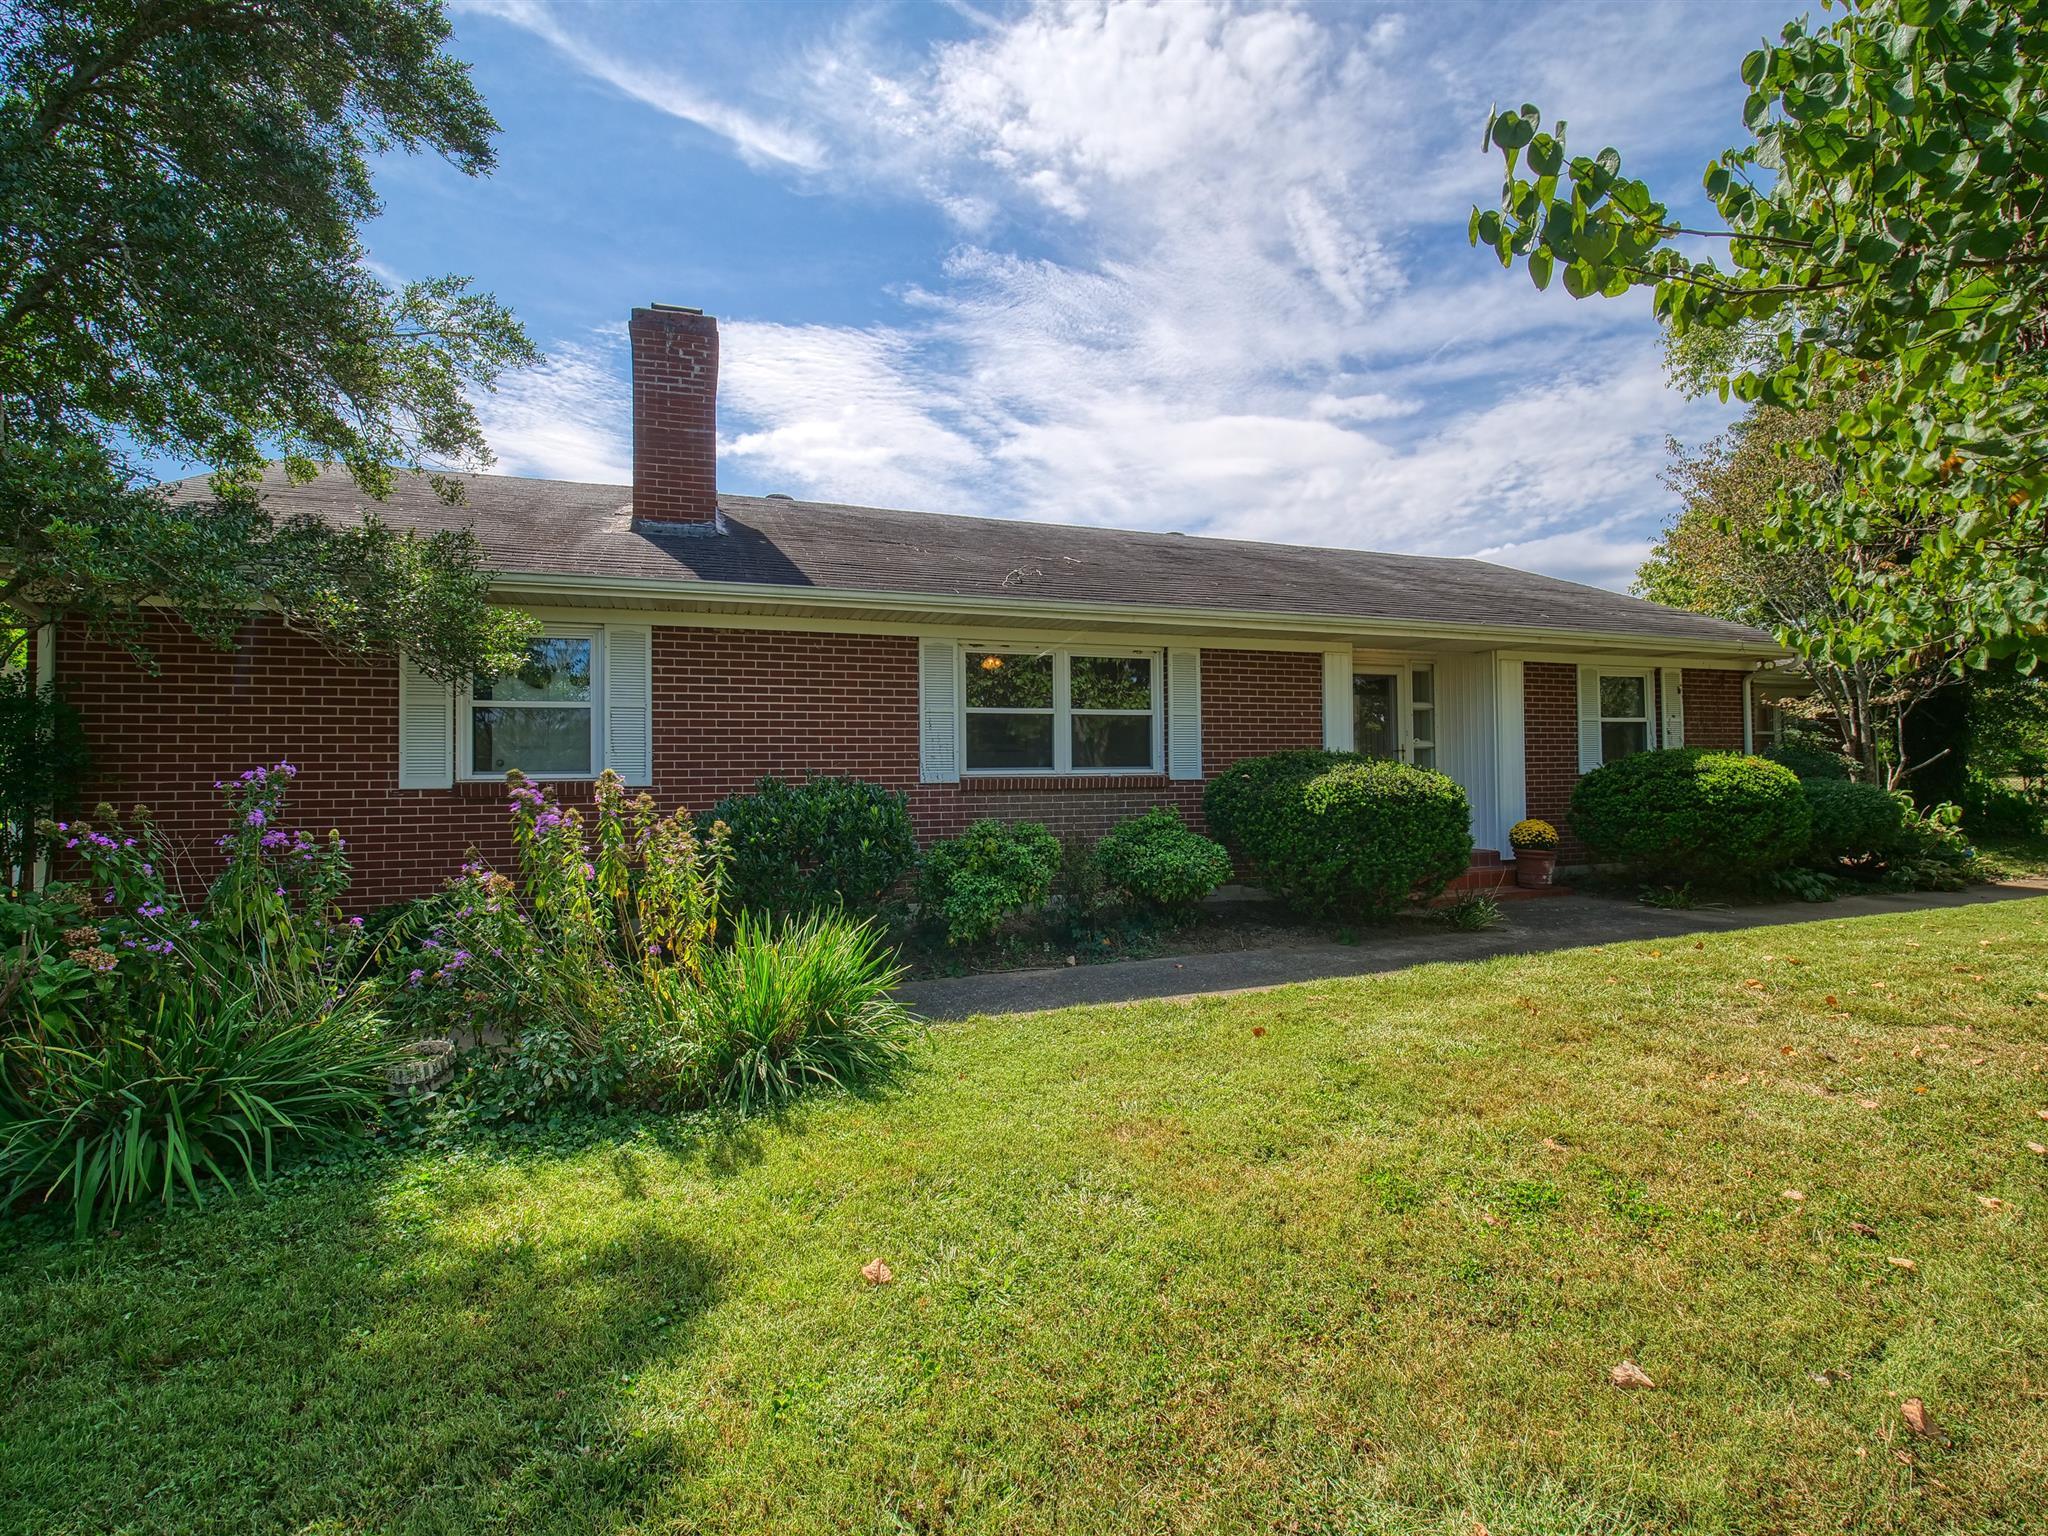 135 Second Creek Ln, Hartsville, TN 37074 - Hartsville, TN real estate listing